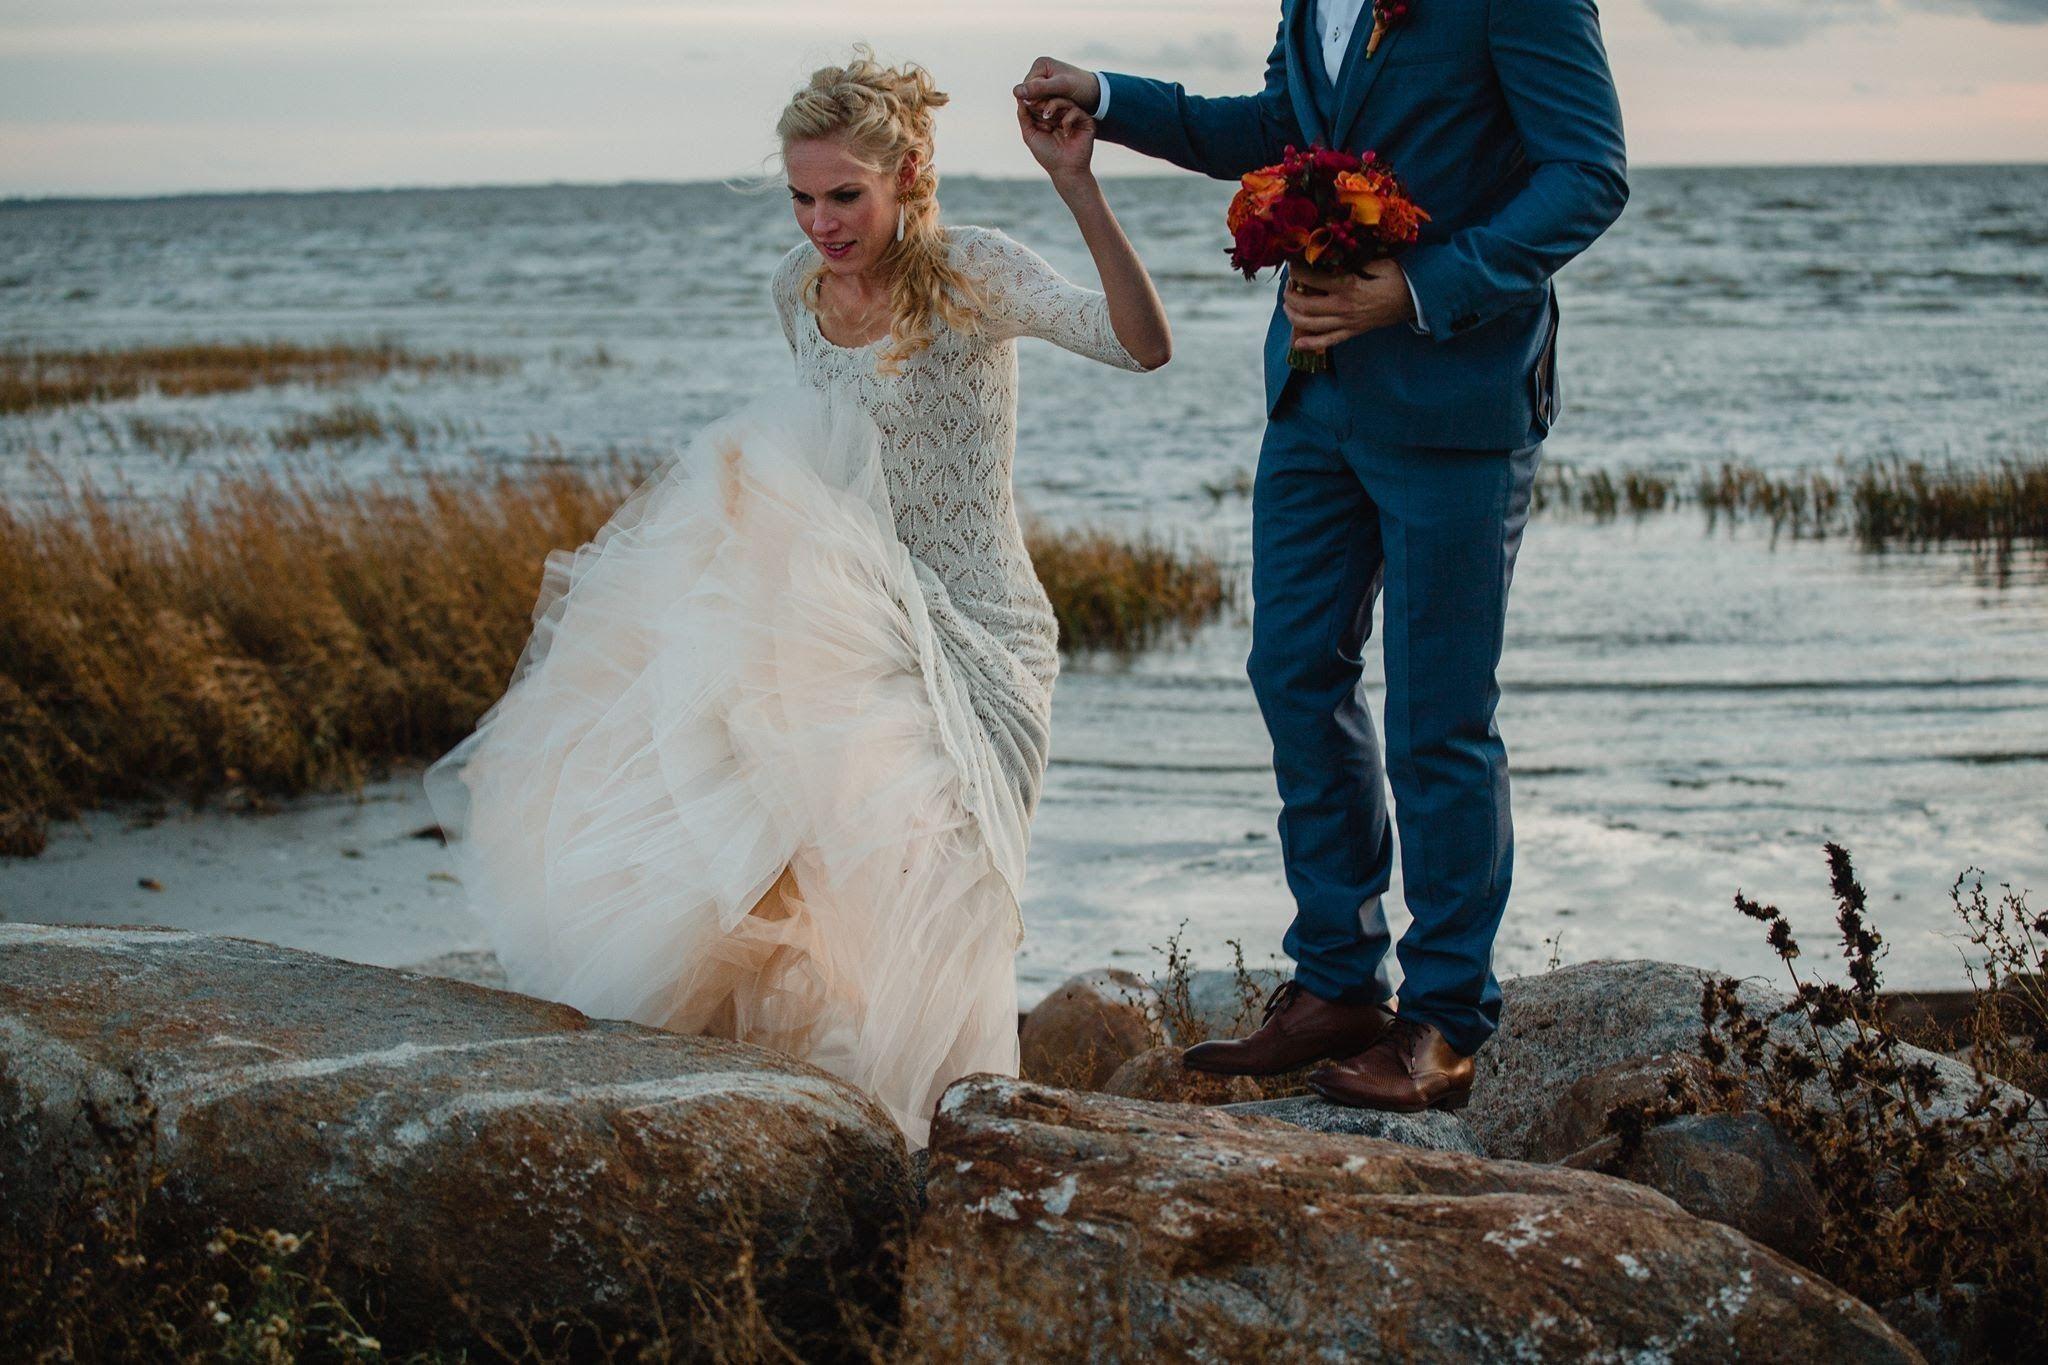 Handknitted wedding dress, knitted by Ivika Viljasaar, Estonia